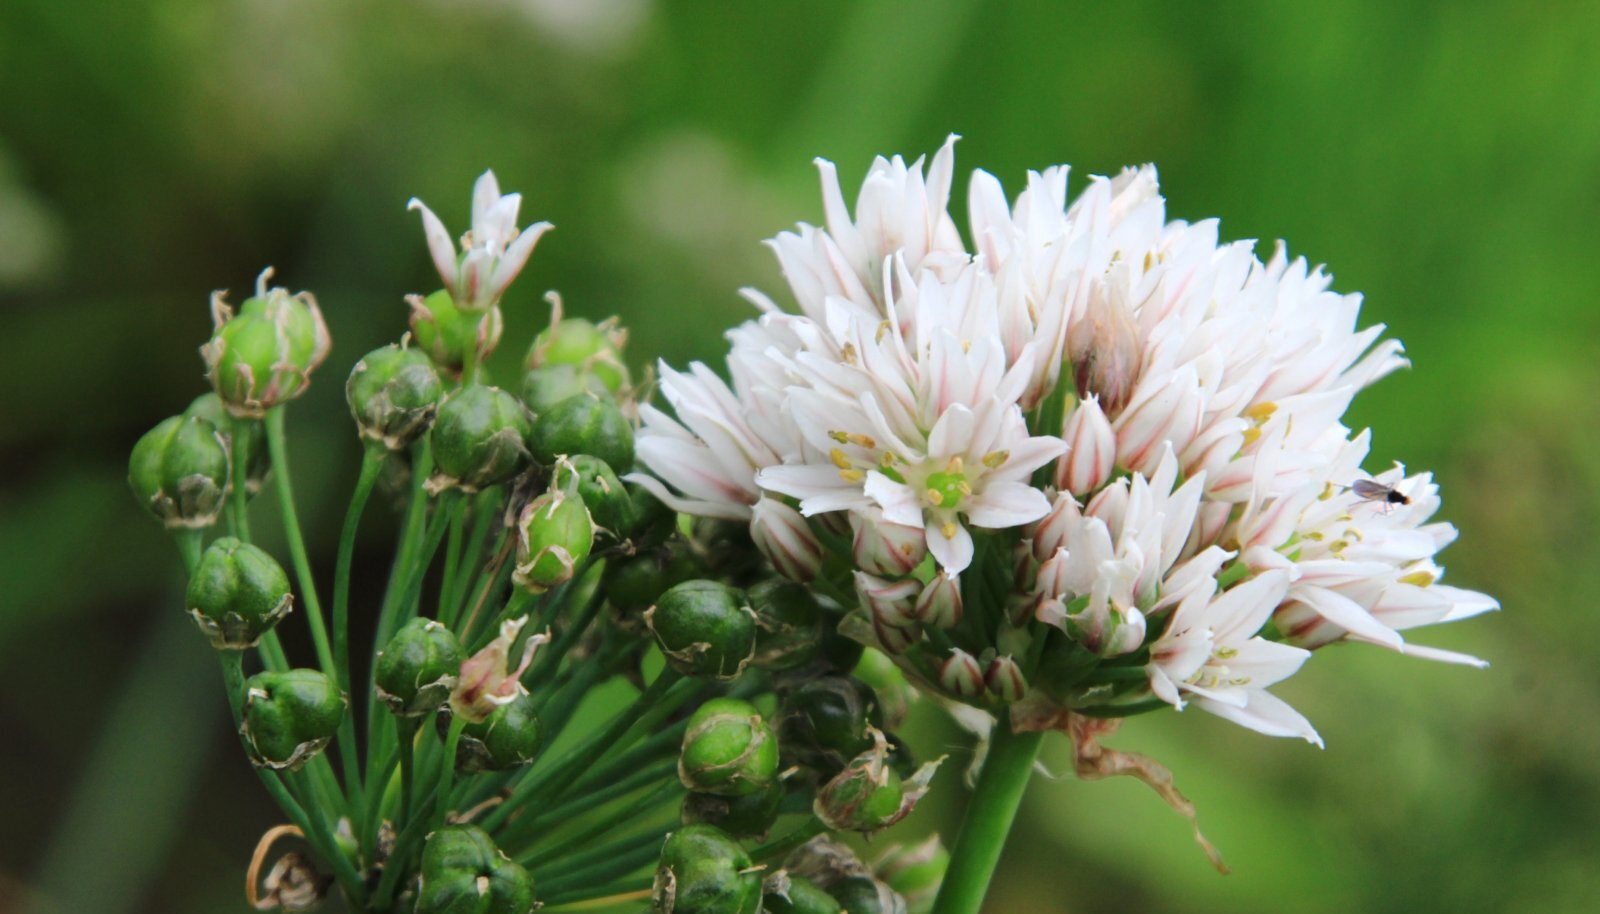 Lõhnav lauk (Allium ramosum)